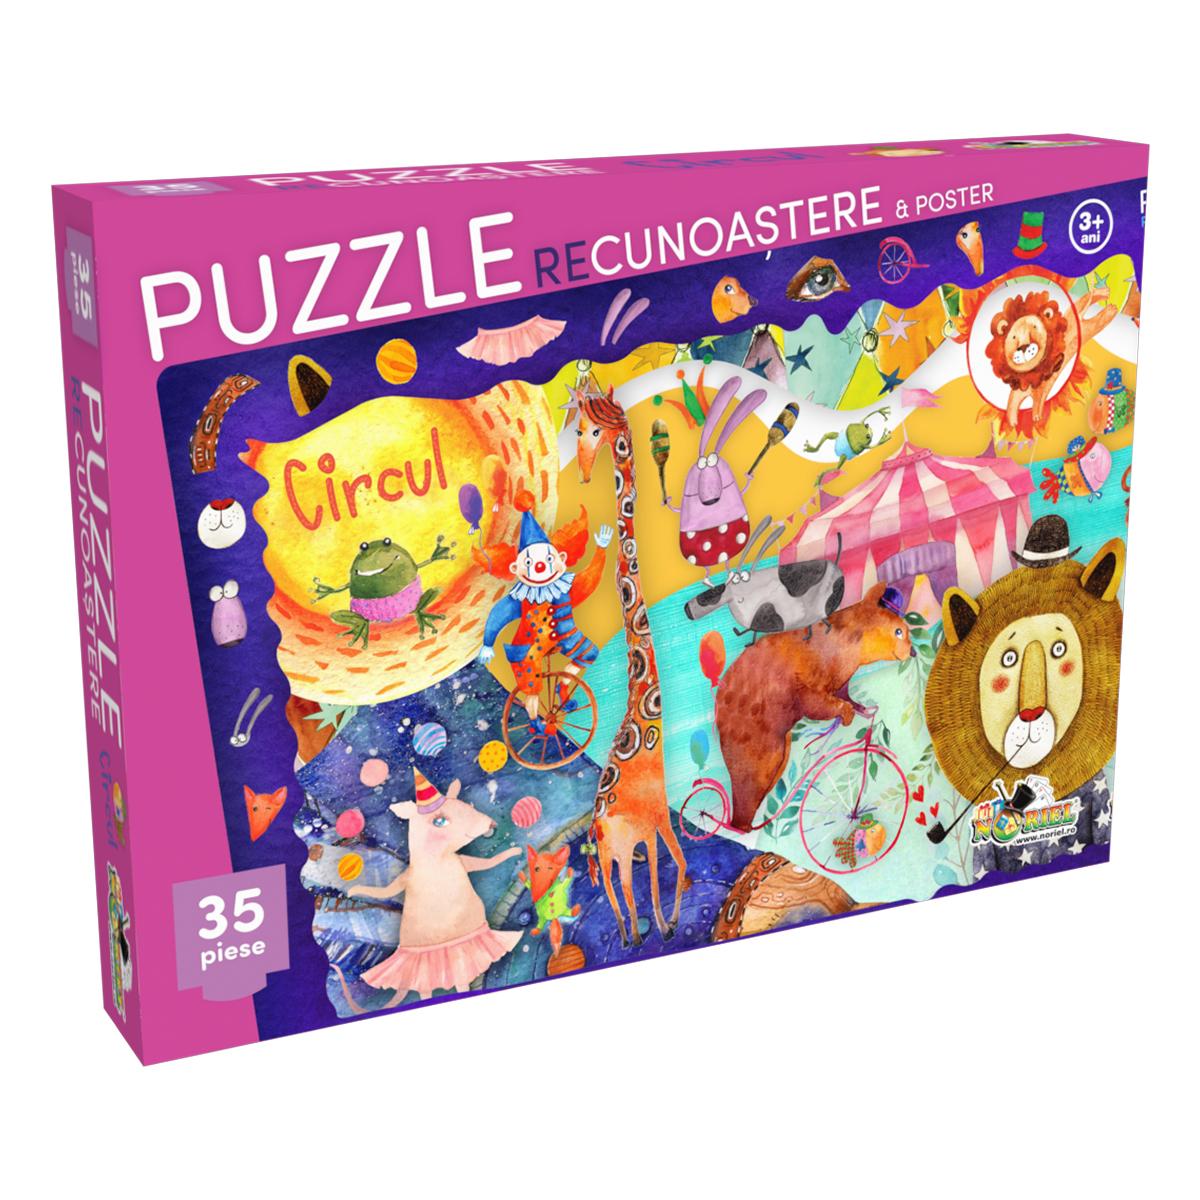 puzzle noriel - recunoastere circul (35 piese)